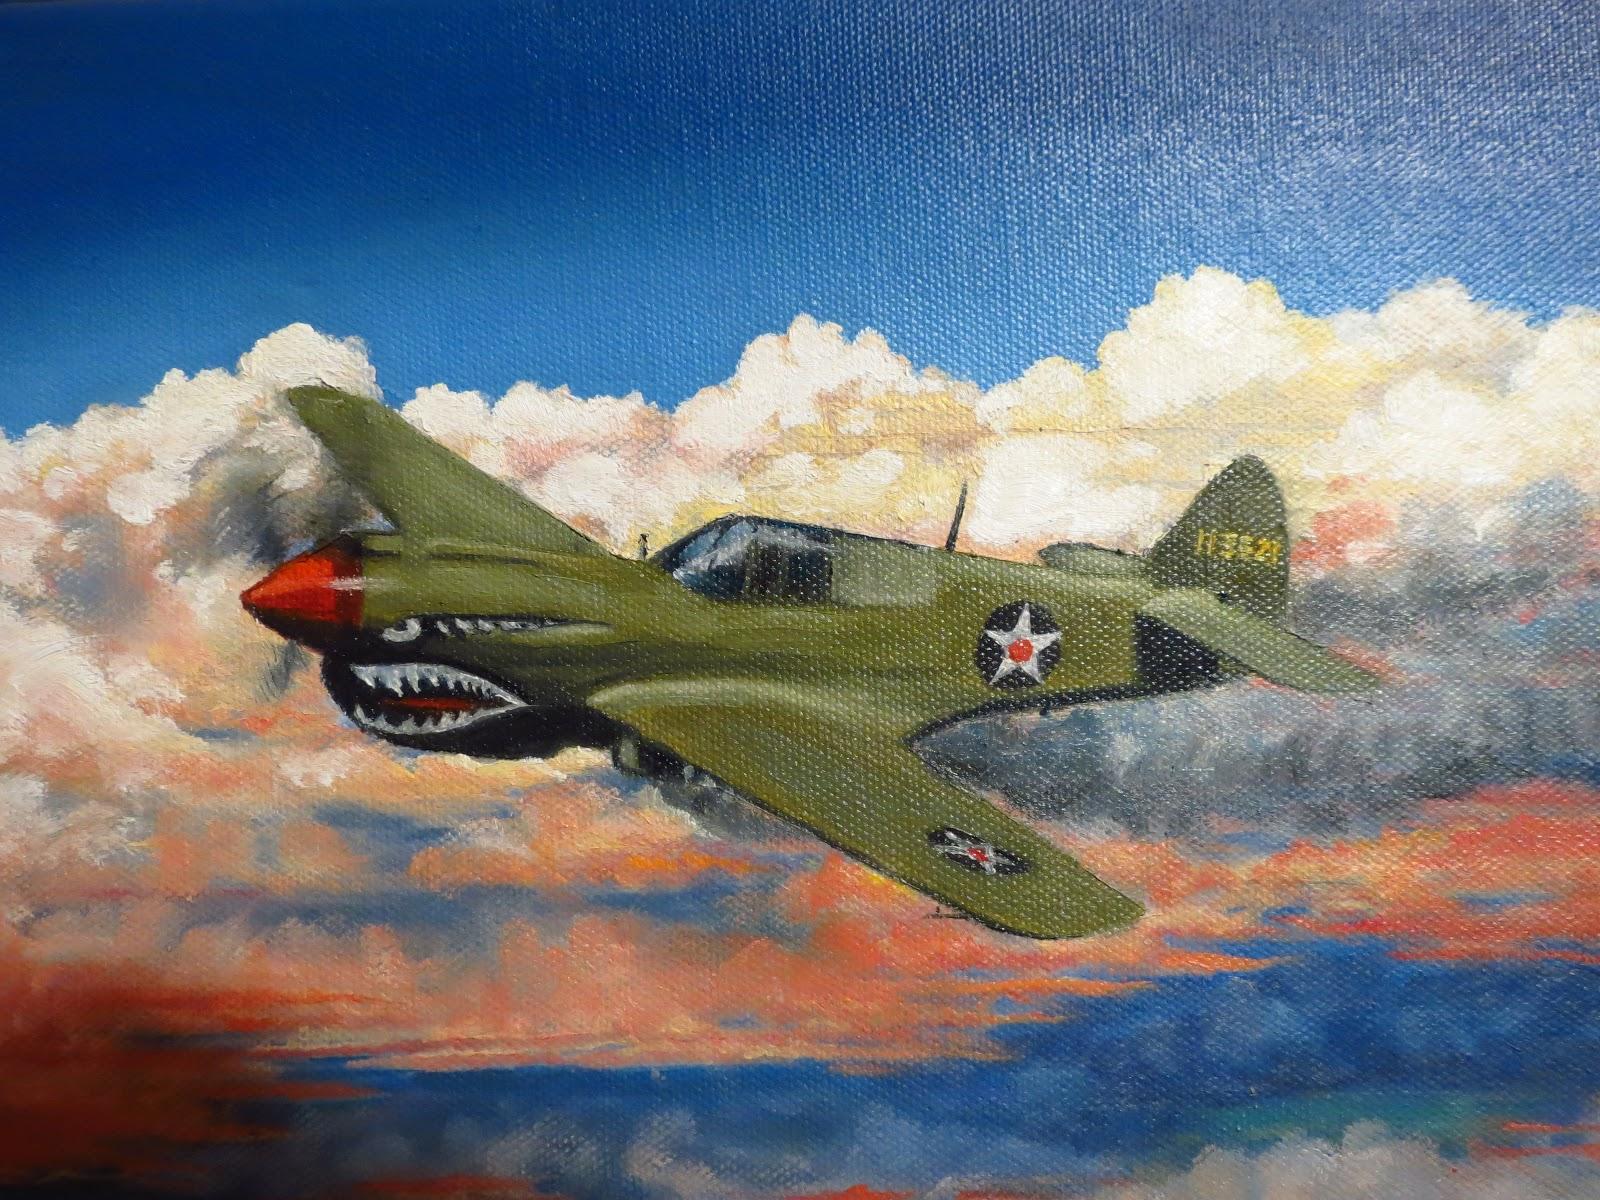 P 51 Mustang  Aviation Art